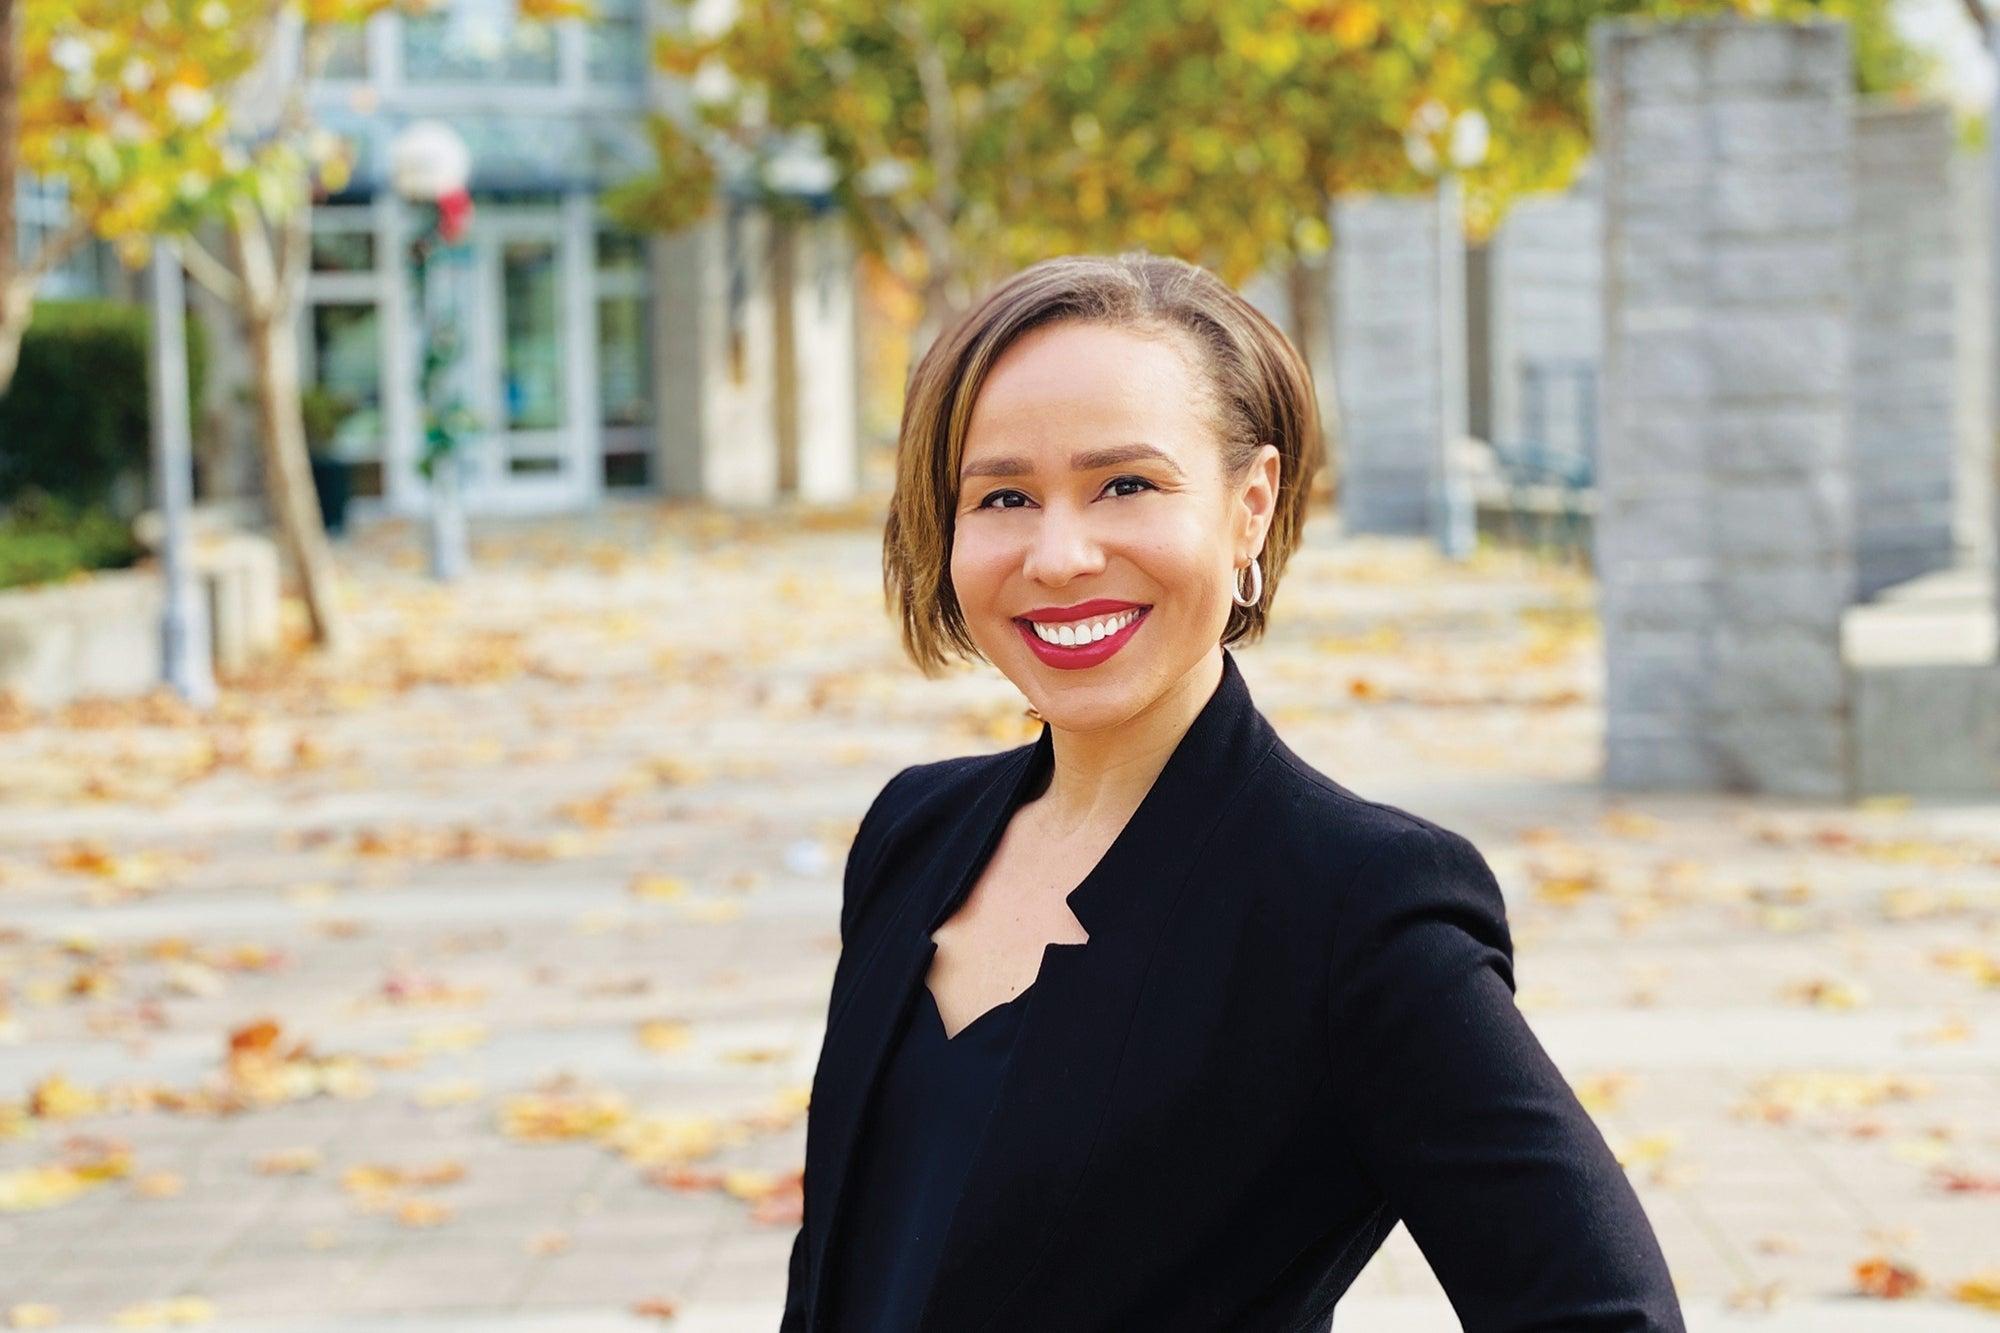 'I'm Black. I'm a Woman. Let's Talk About Raising Venture Capital.'